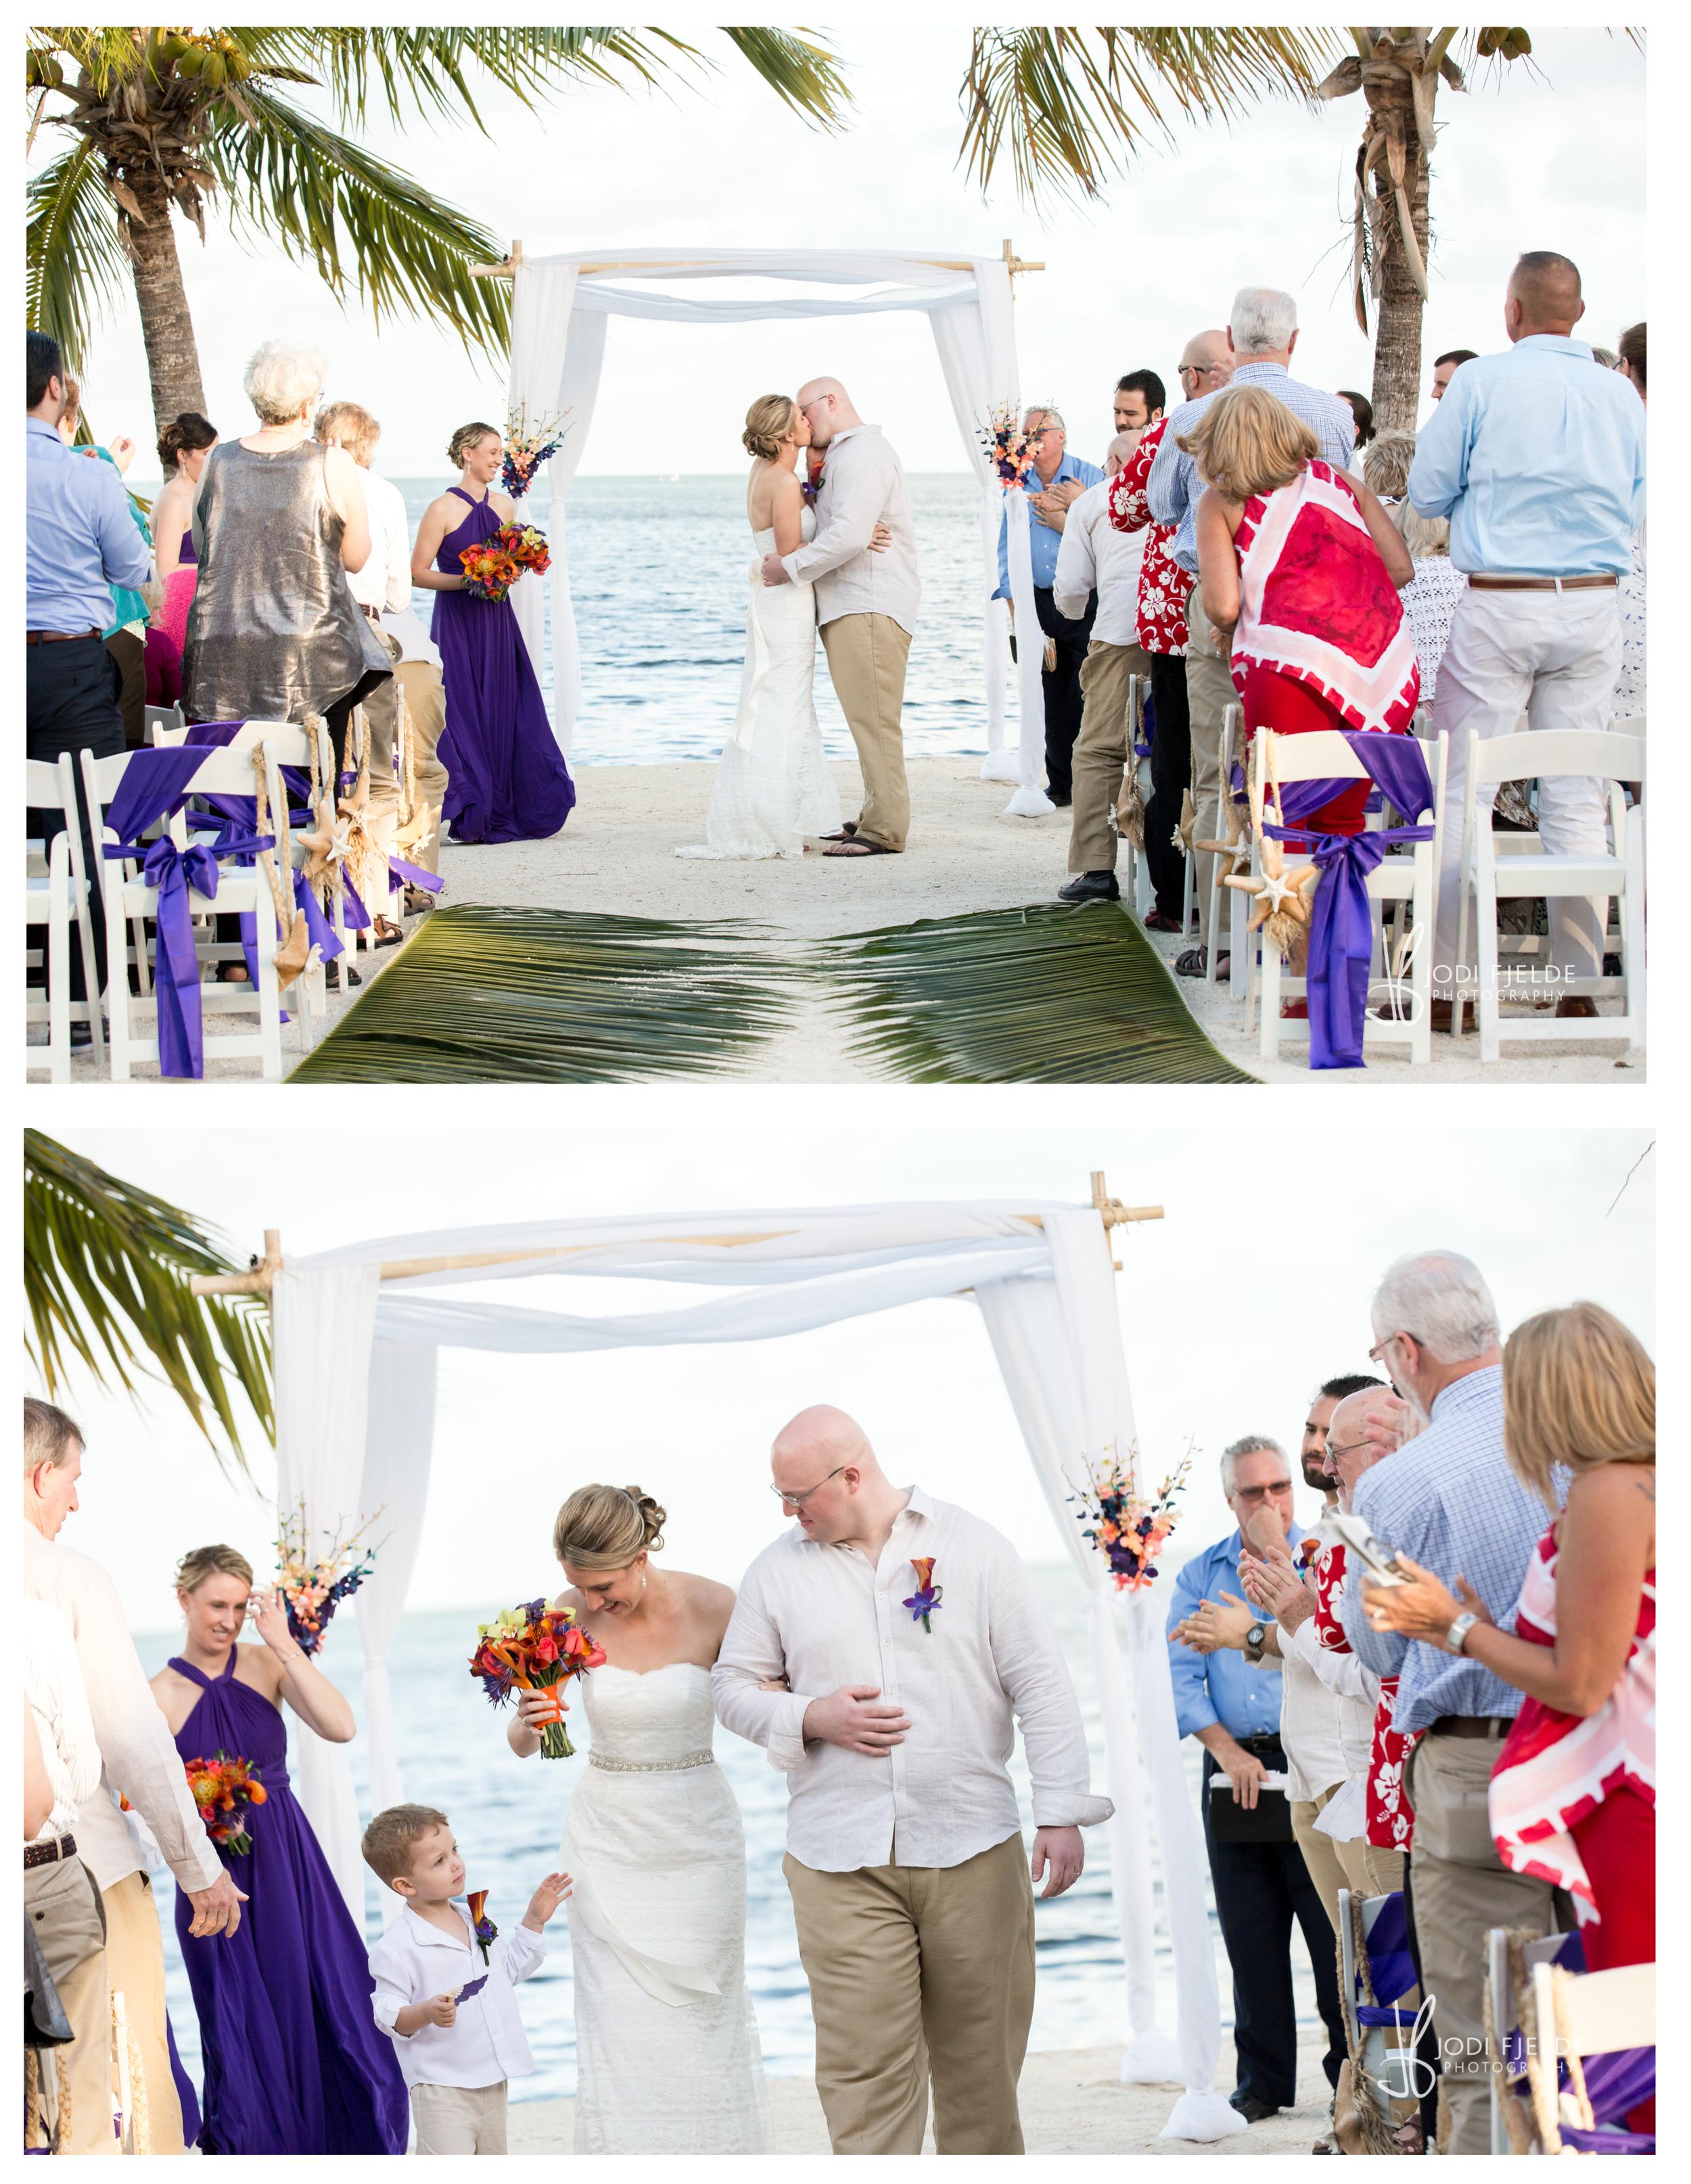 Cocconut_Cove_&_ Marina_ wedding_Kayla_and_Patrick 23.jpg